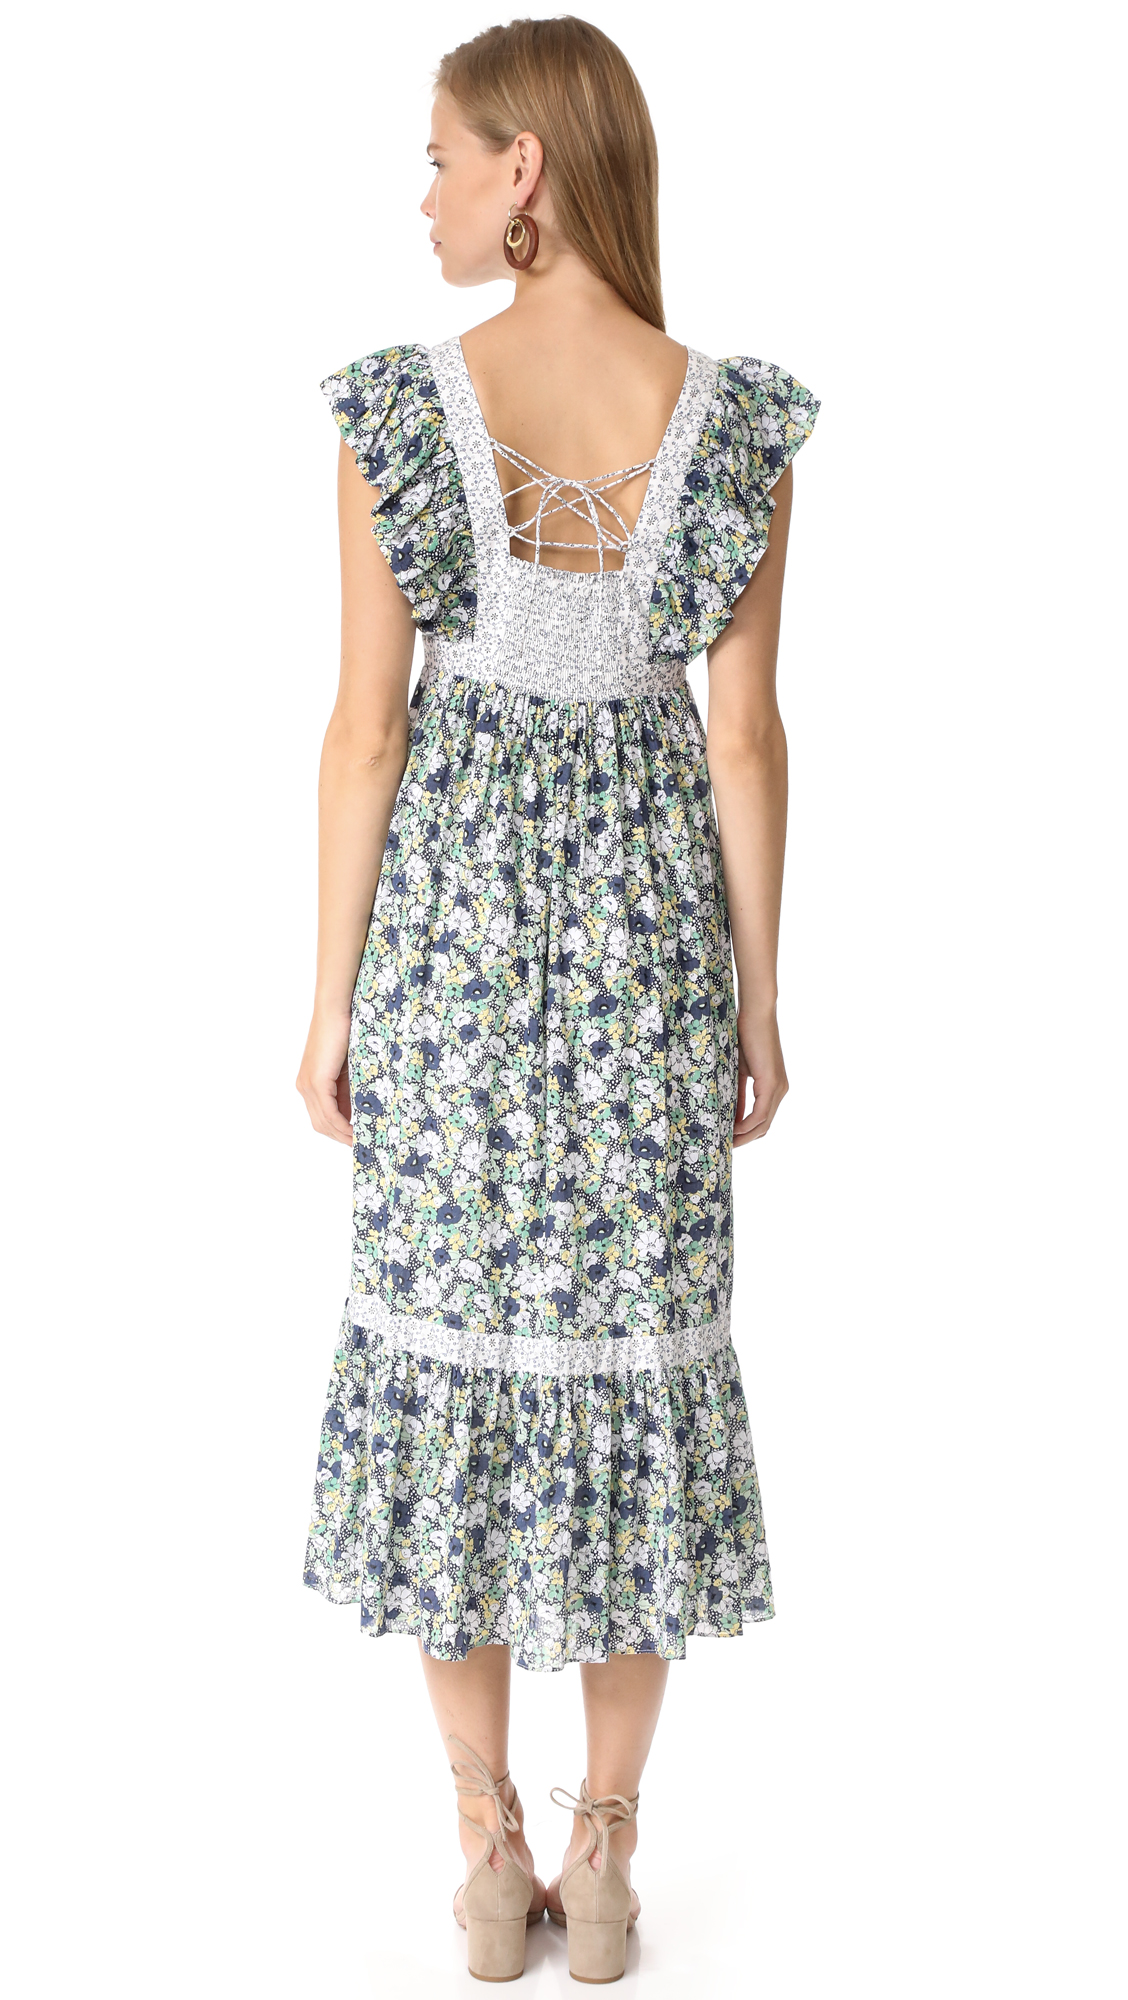 76bcd8ffee8 La Vie Rebecca Taylor Sleeveless Fleur Suzette Dress